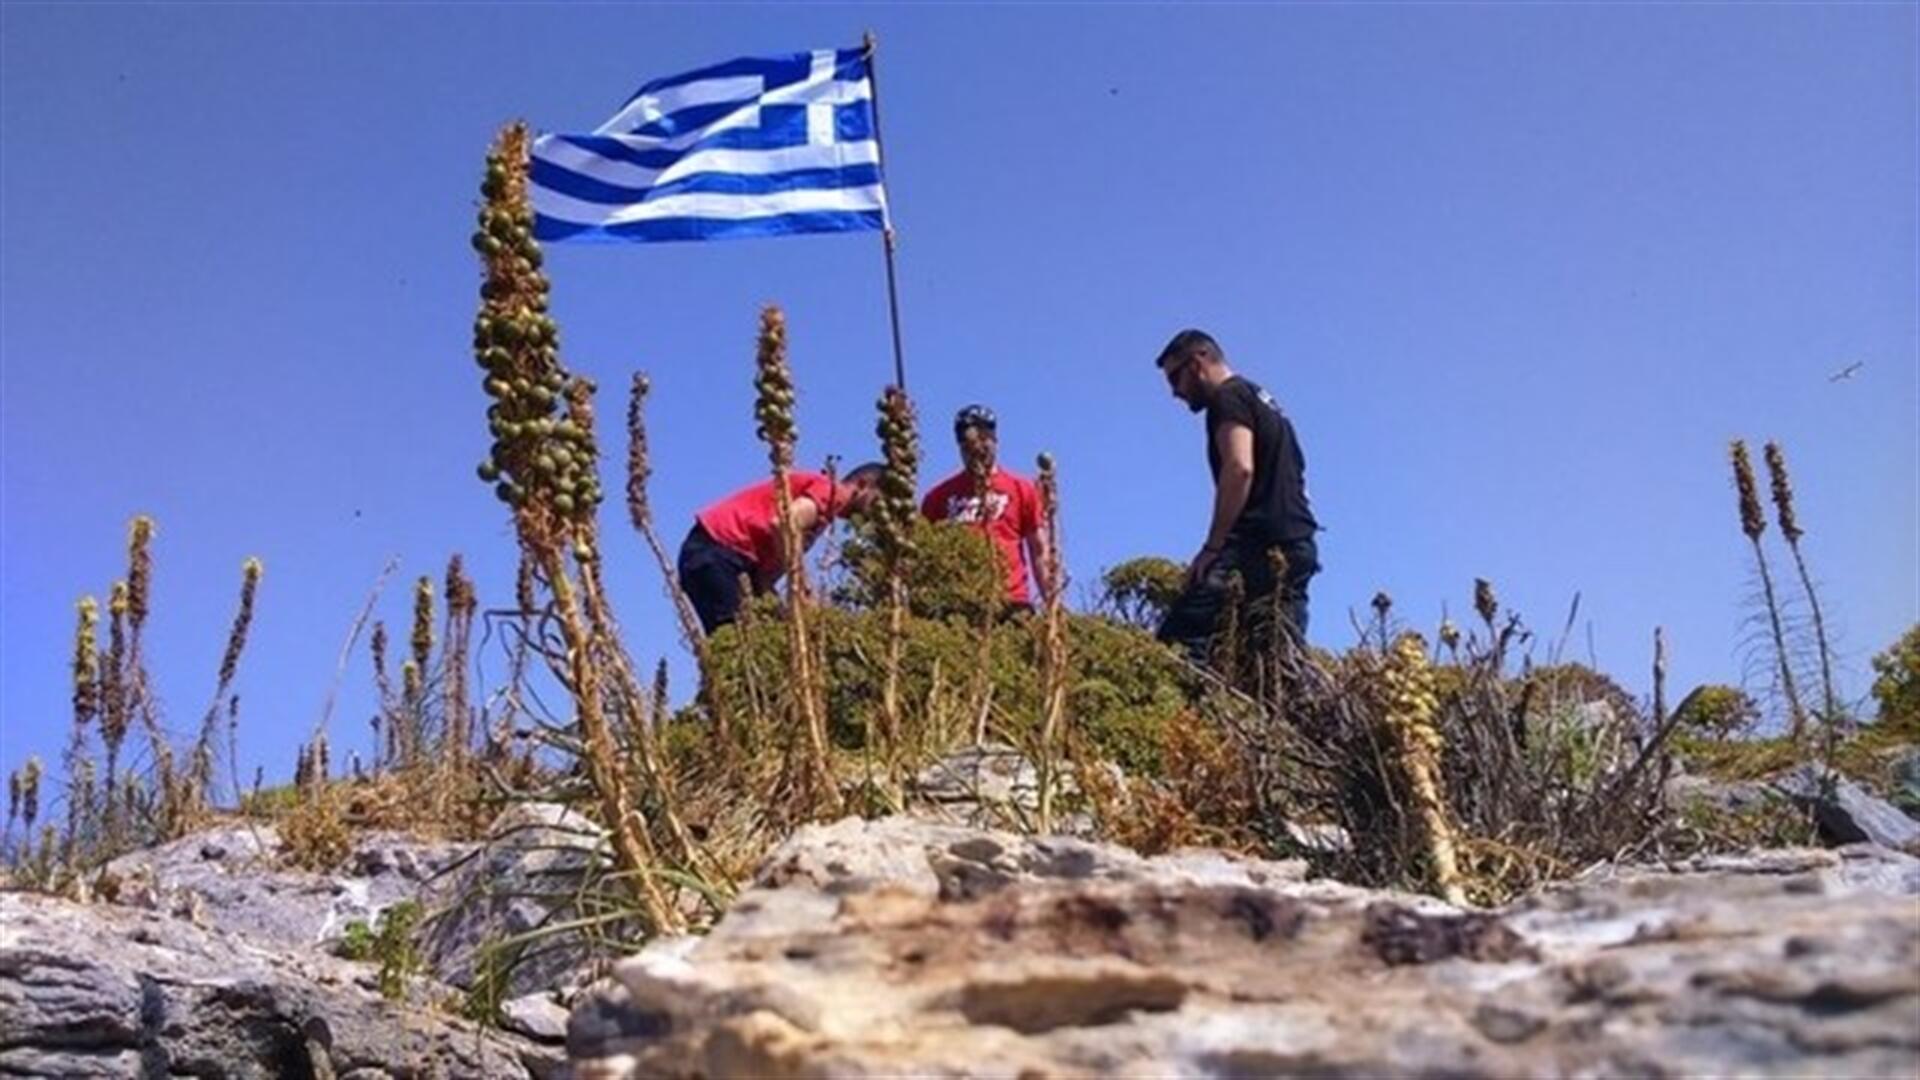 Turkey warns Greece over 'provocation' in Aegean - Turkey News